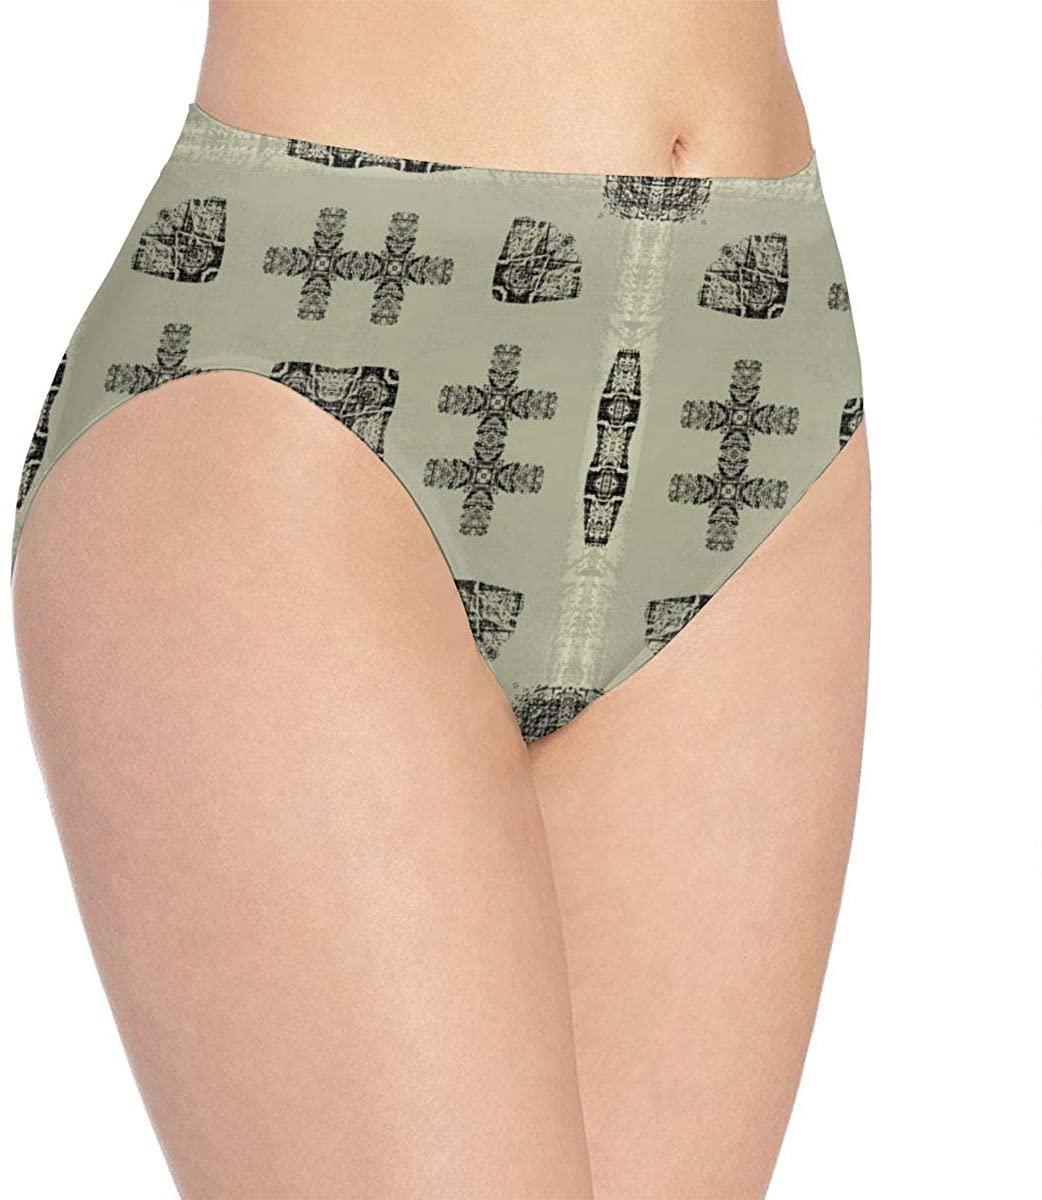 Art Vintage Geometric Maze Womens Stretch Seamless Underwear Laser Cut Bikini Panties